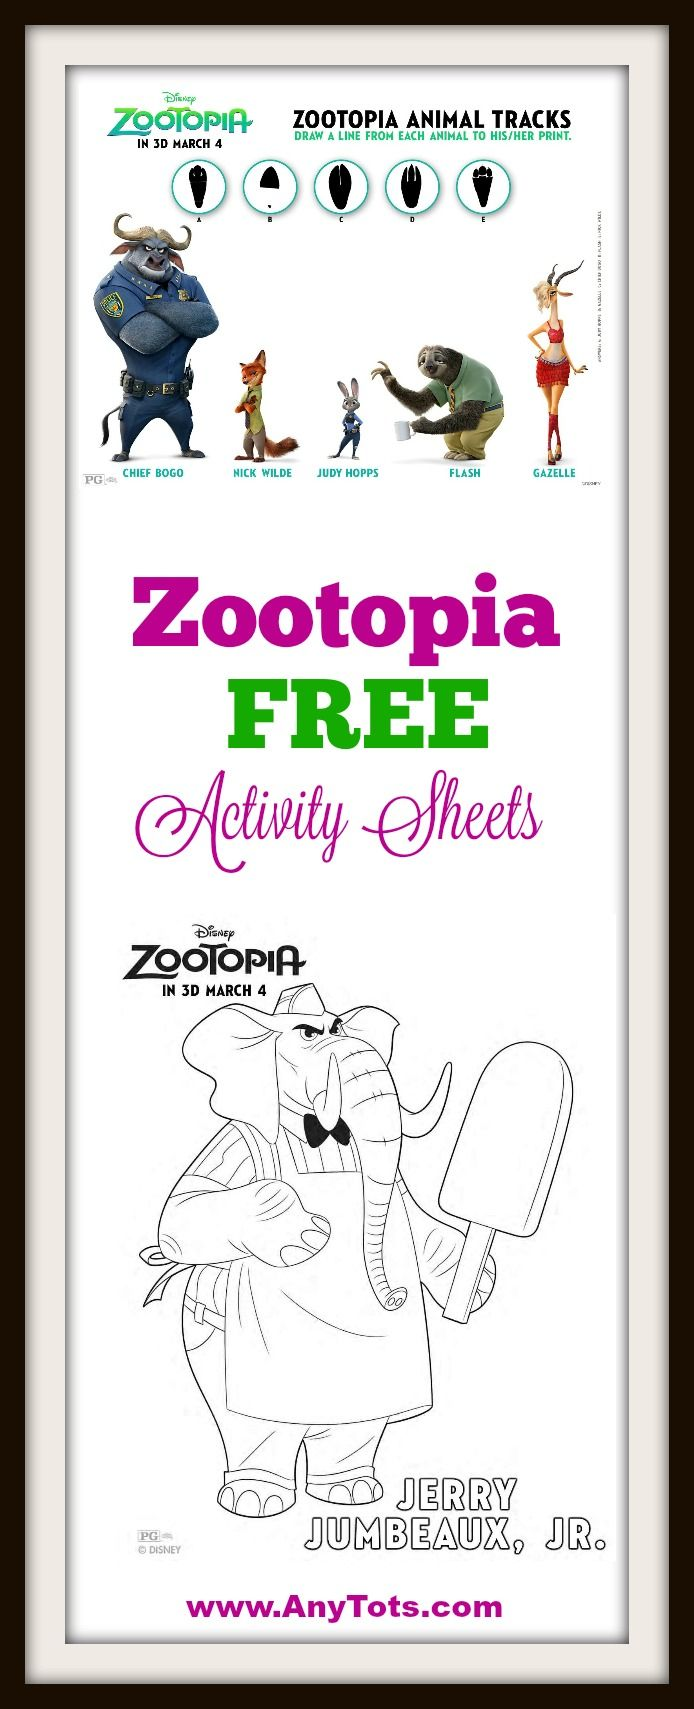 Zootopia Free Printable Coloring Sheets Visit Www Anytots Com For More Free Disney Printa Free Printable Coloring Sheets Disney Printables Free Zootopia Party [ 1709 x 694 Pixel ]